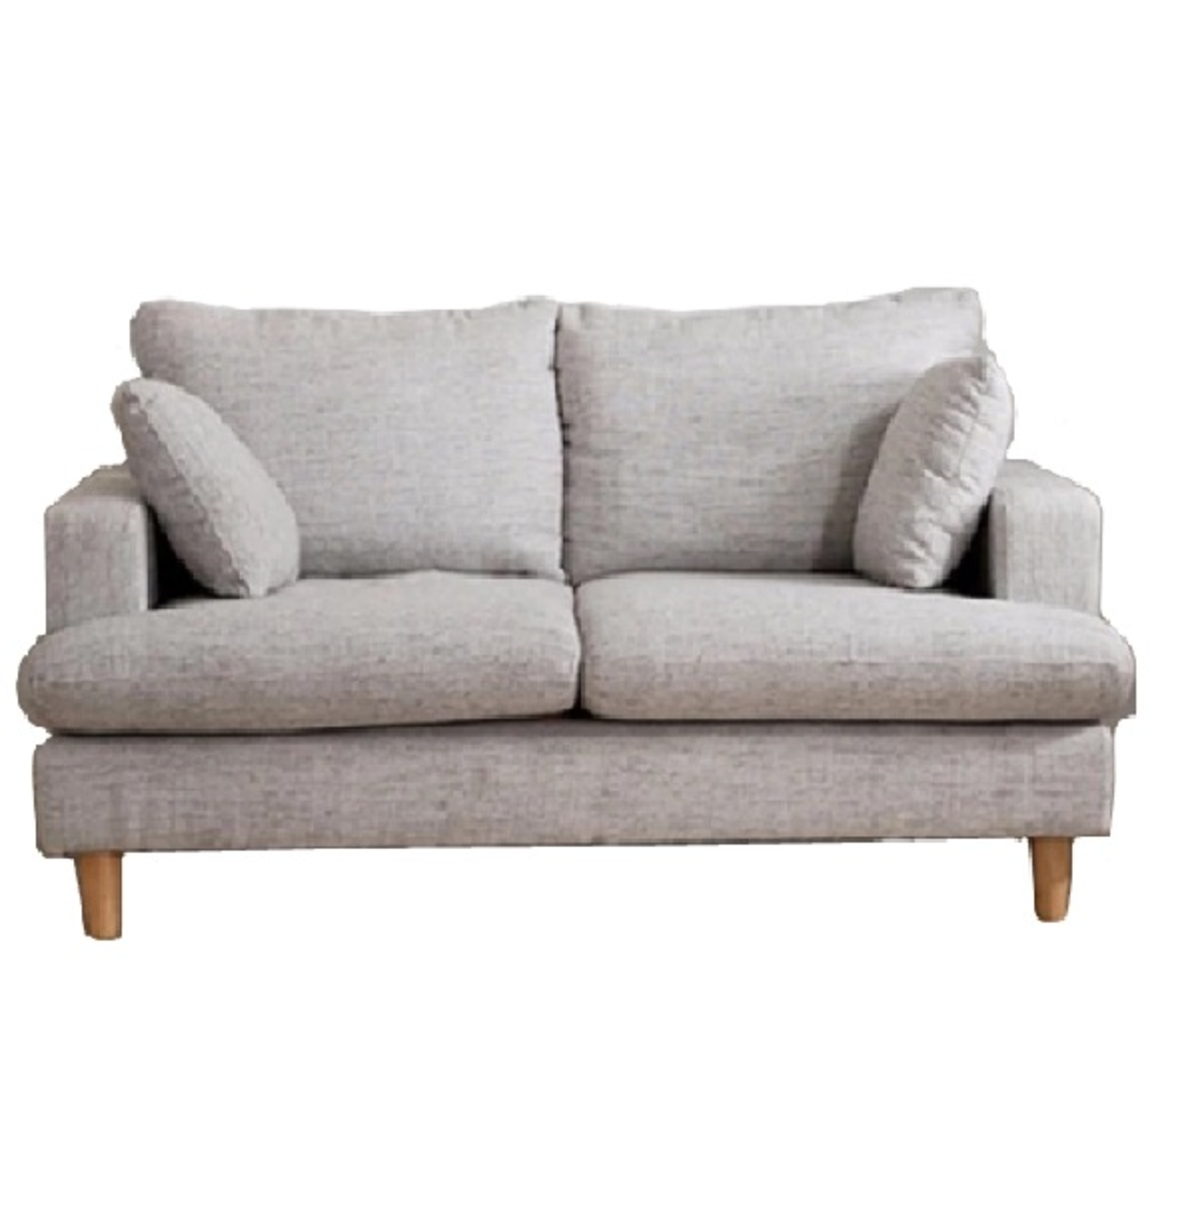 Muebles 3 Seater Sofa Livart Design Go Shop # Muebles Top Garden